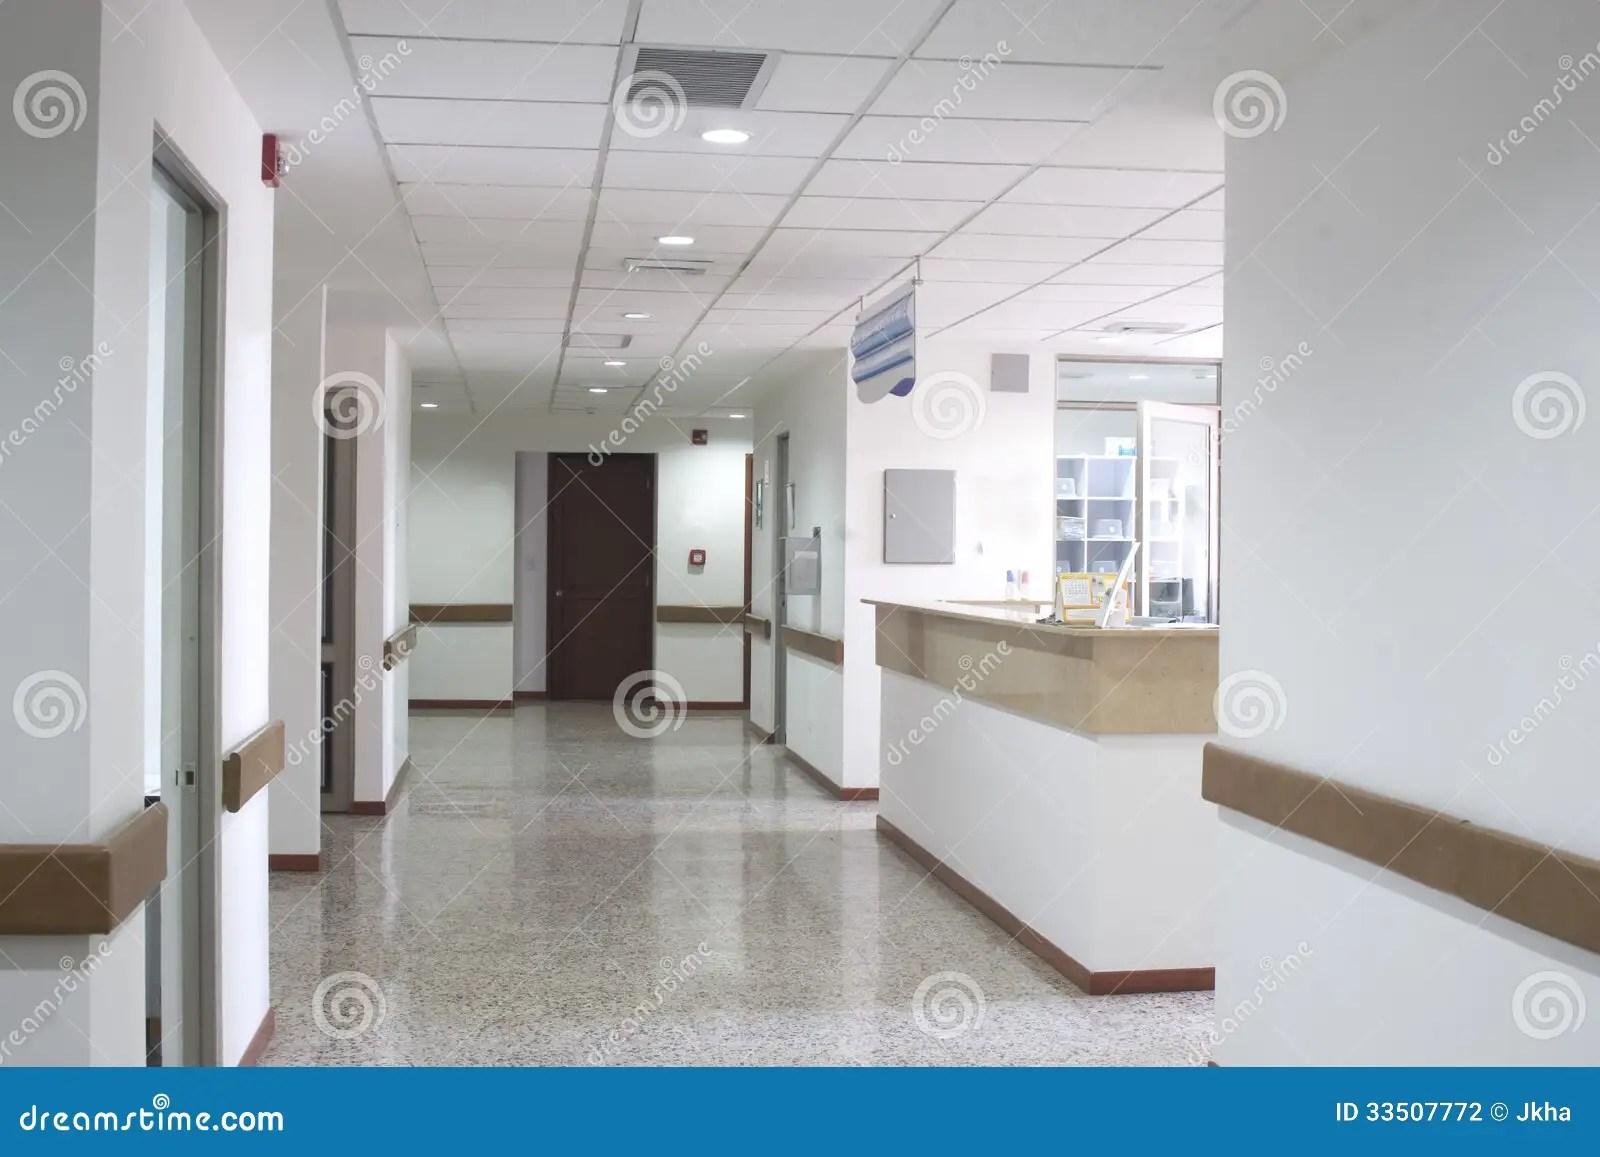 Corridor Interior Inside A Modern Hospital Stock